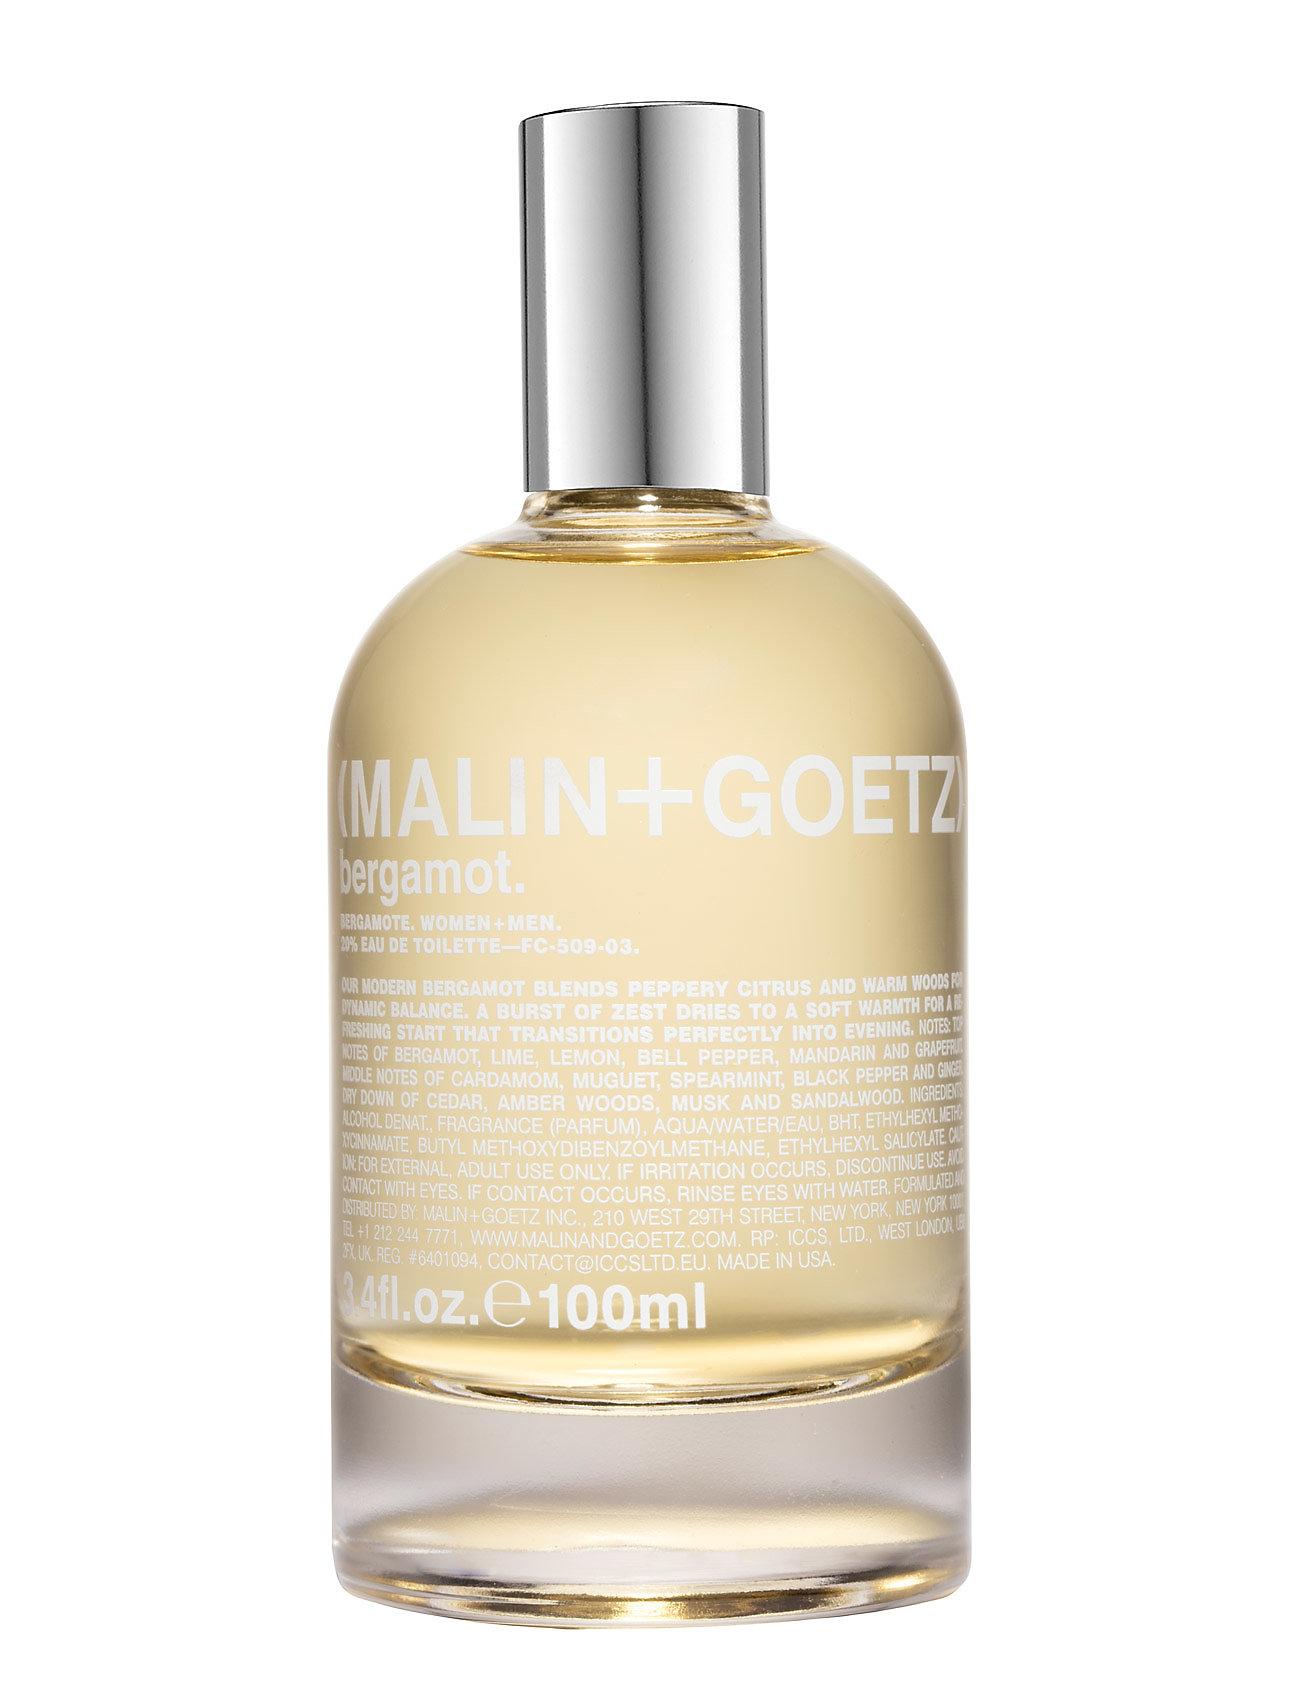 malin+goetz Bergamot eau de toilette på boozt.com dk